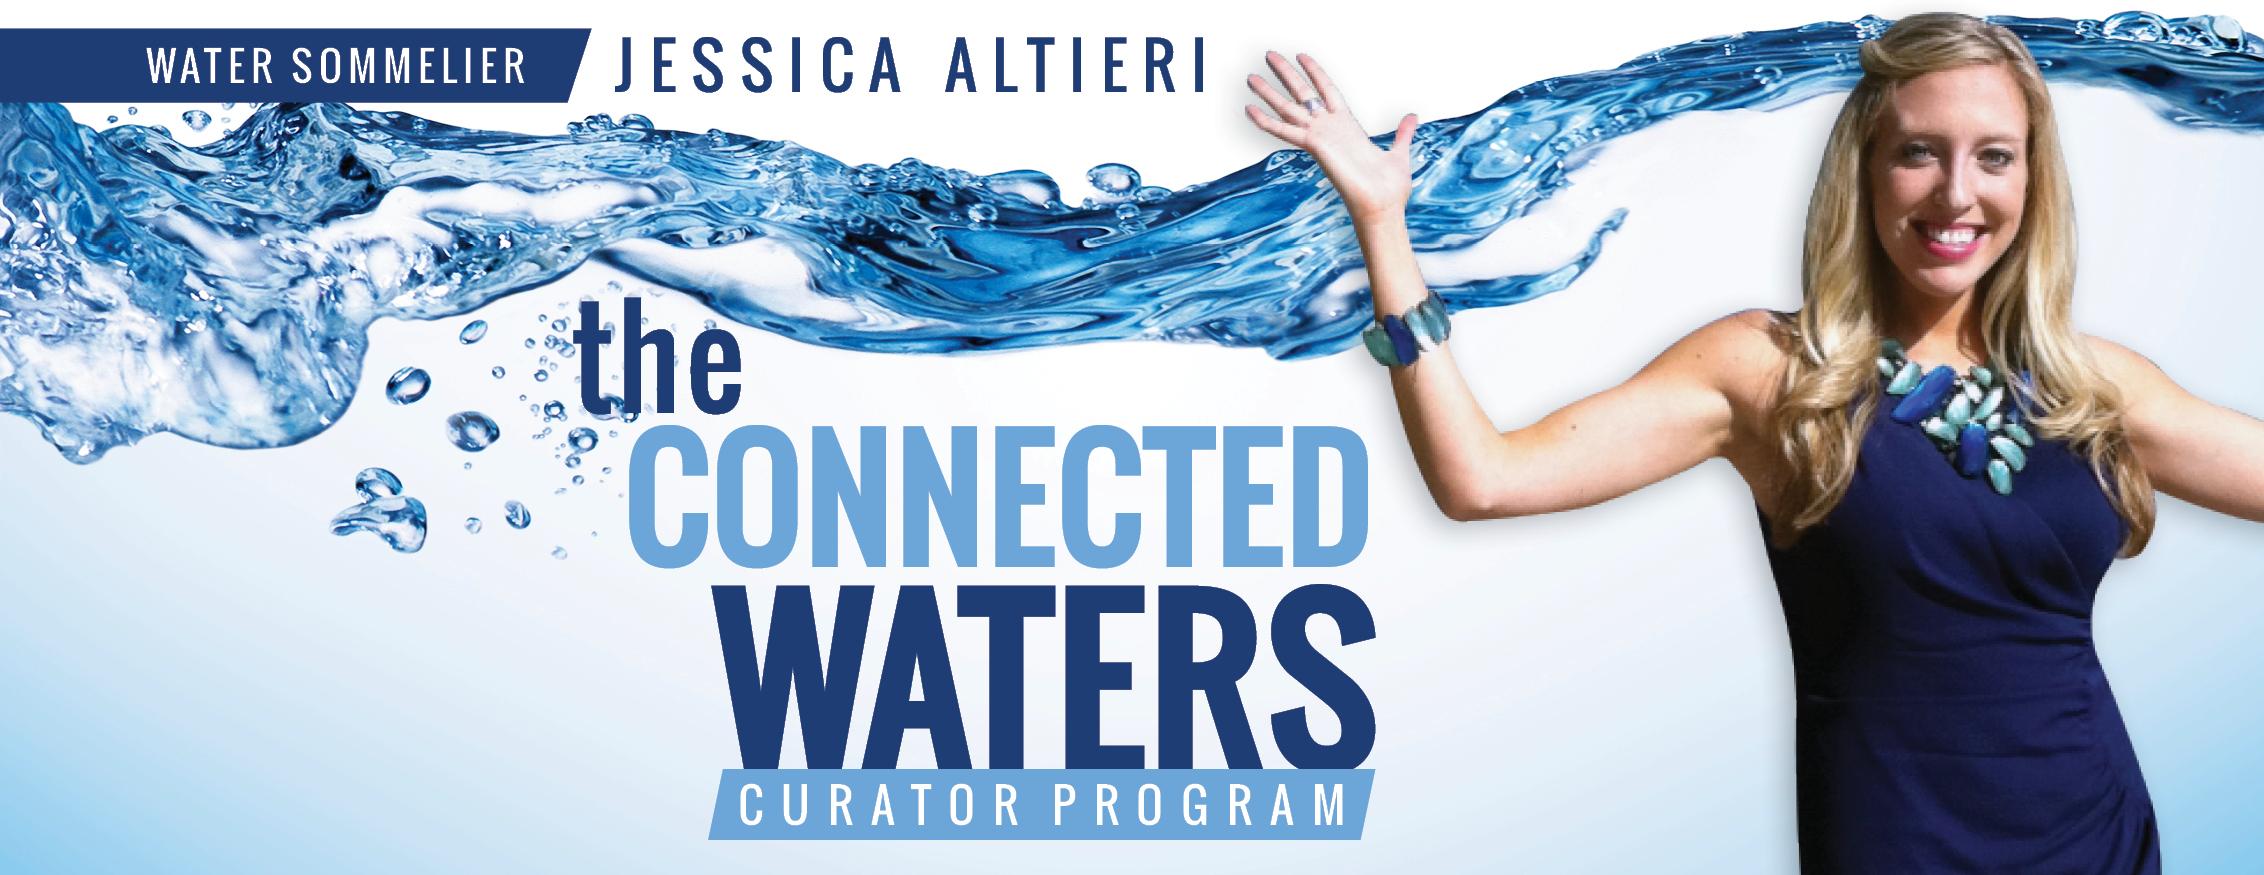 Water Sommelier Jessica Altieri